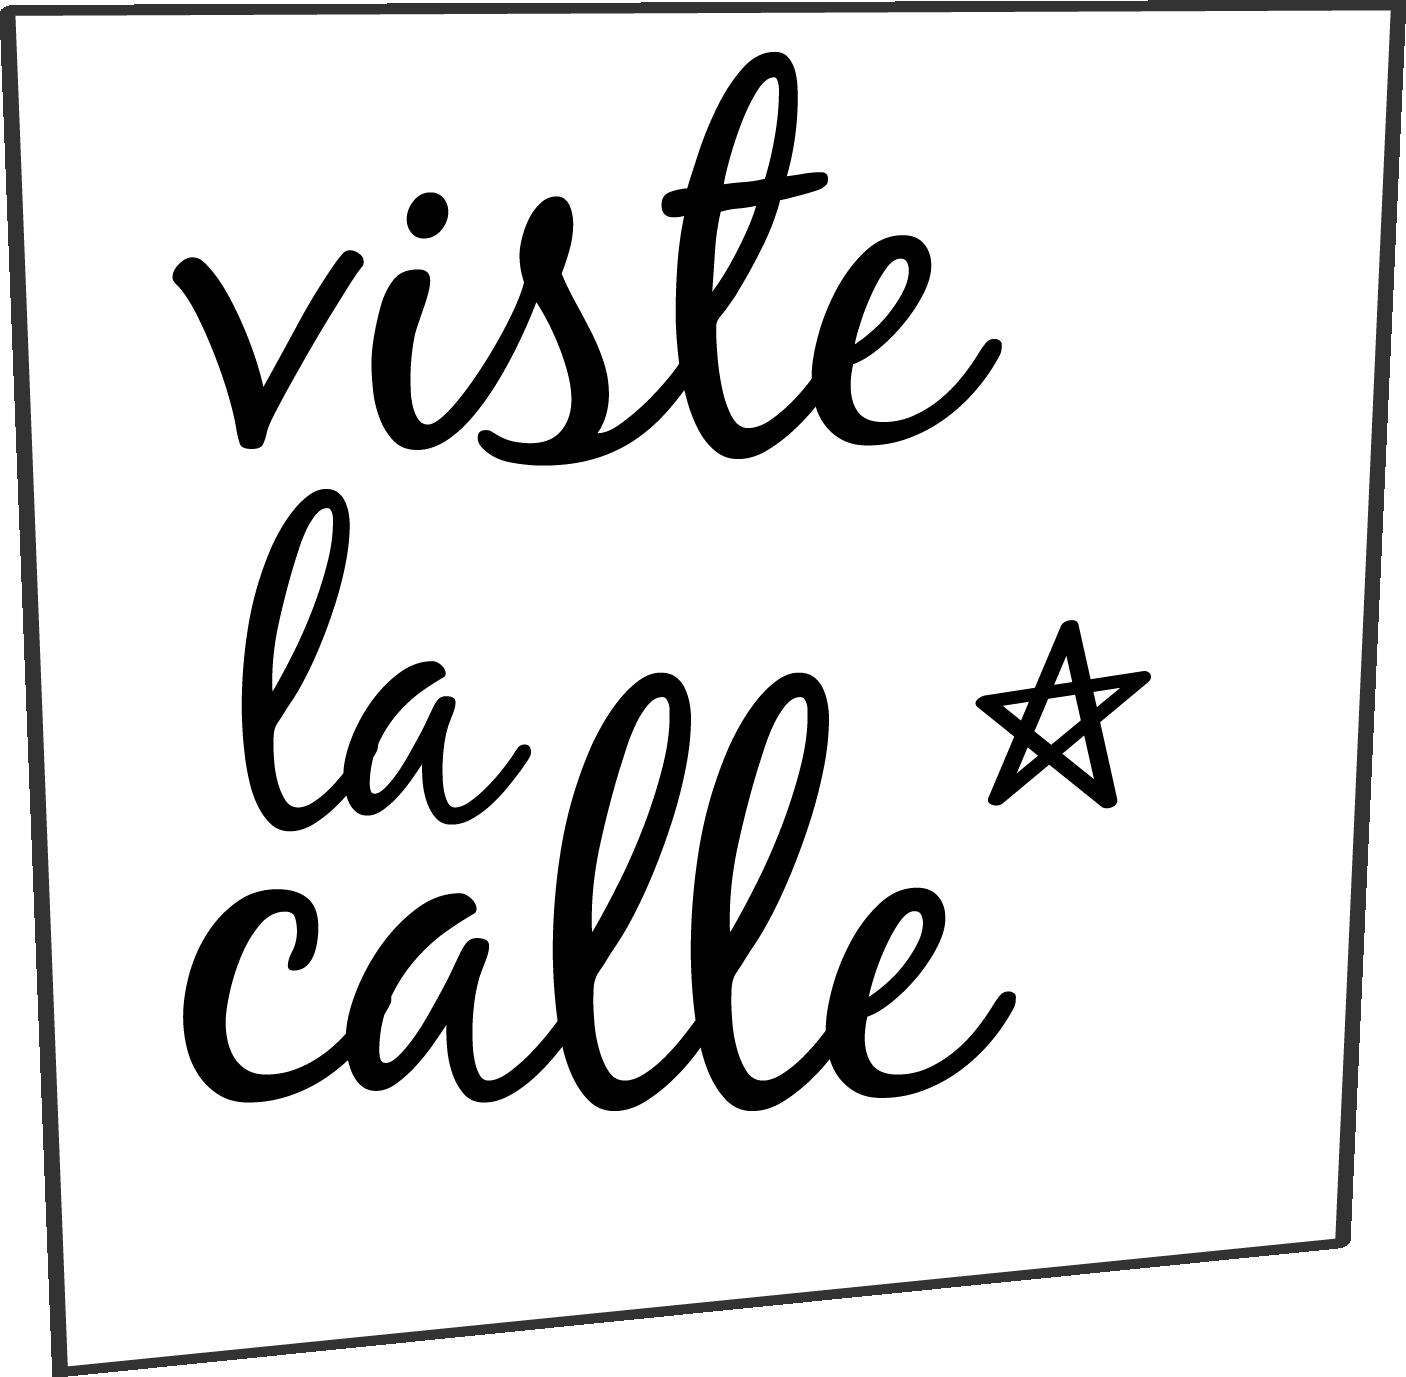 VESTE LA CALLE